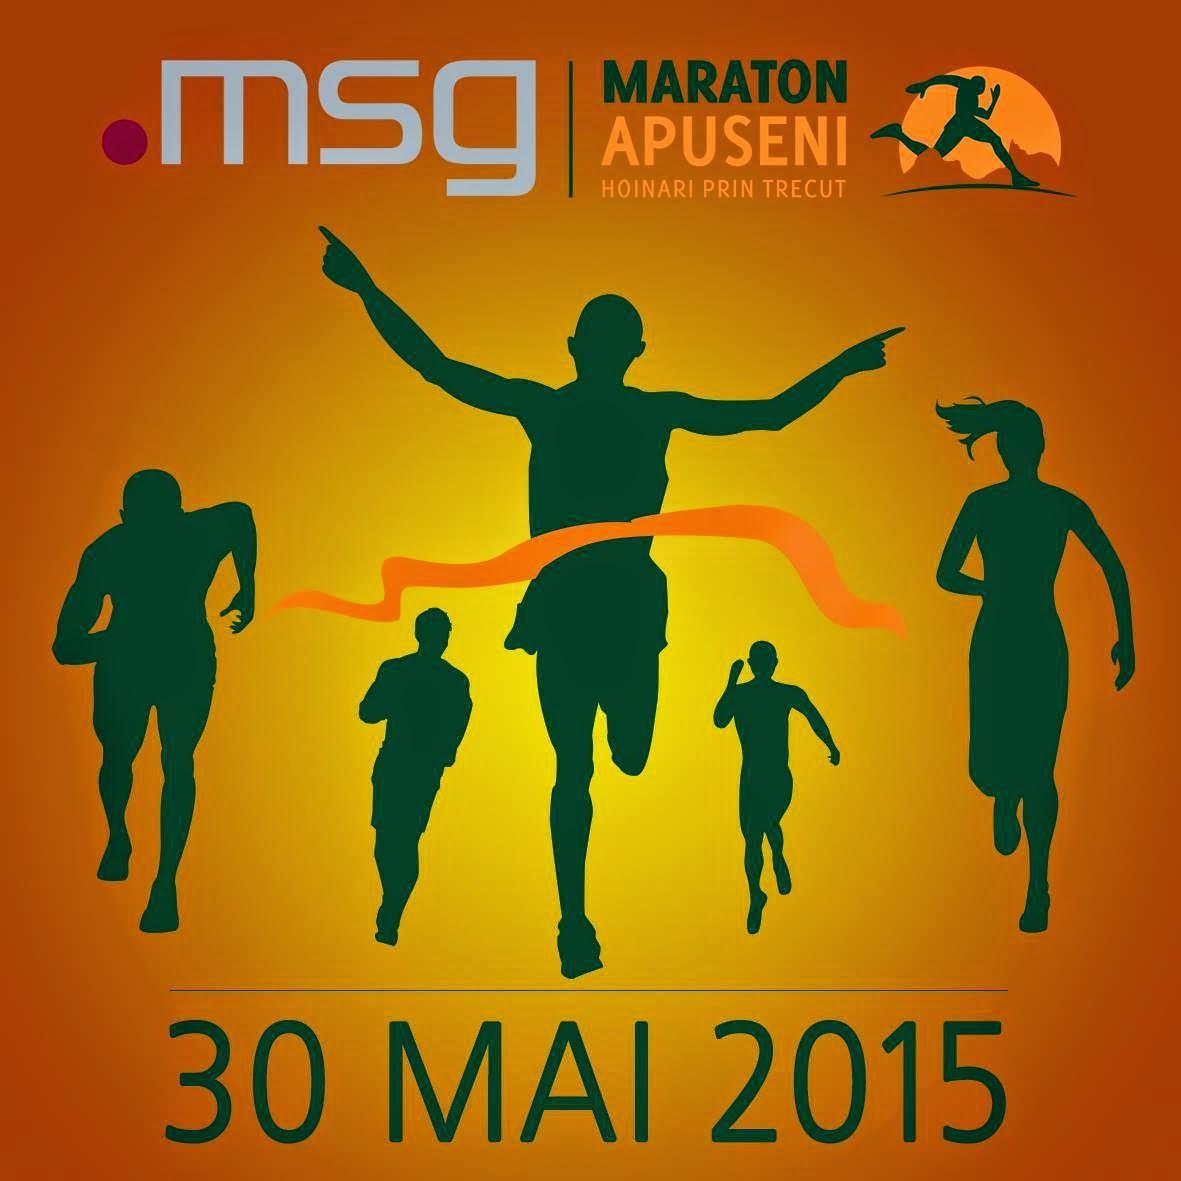 Maraton Apuseni 2015